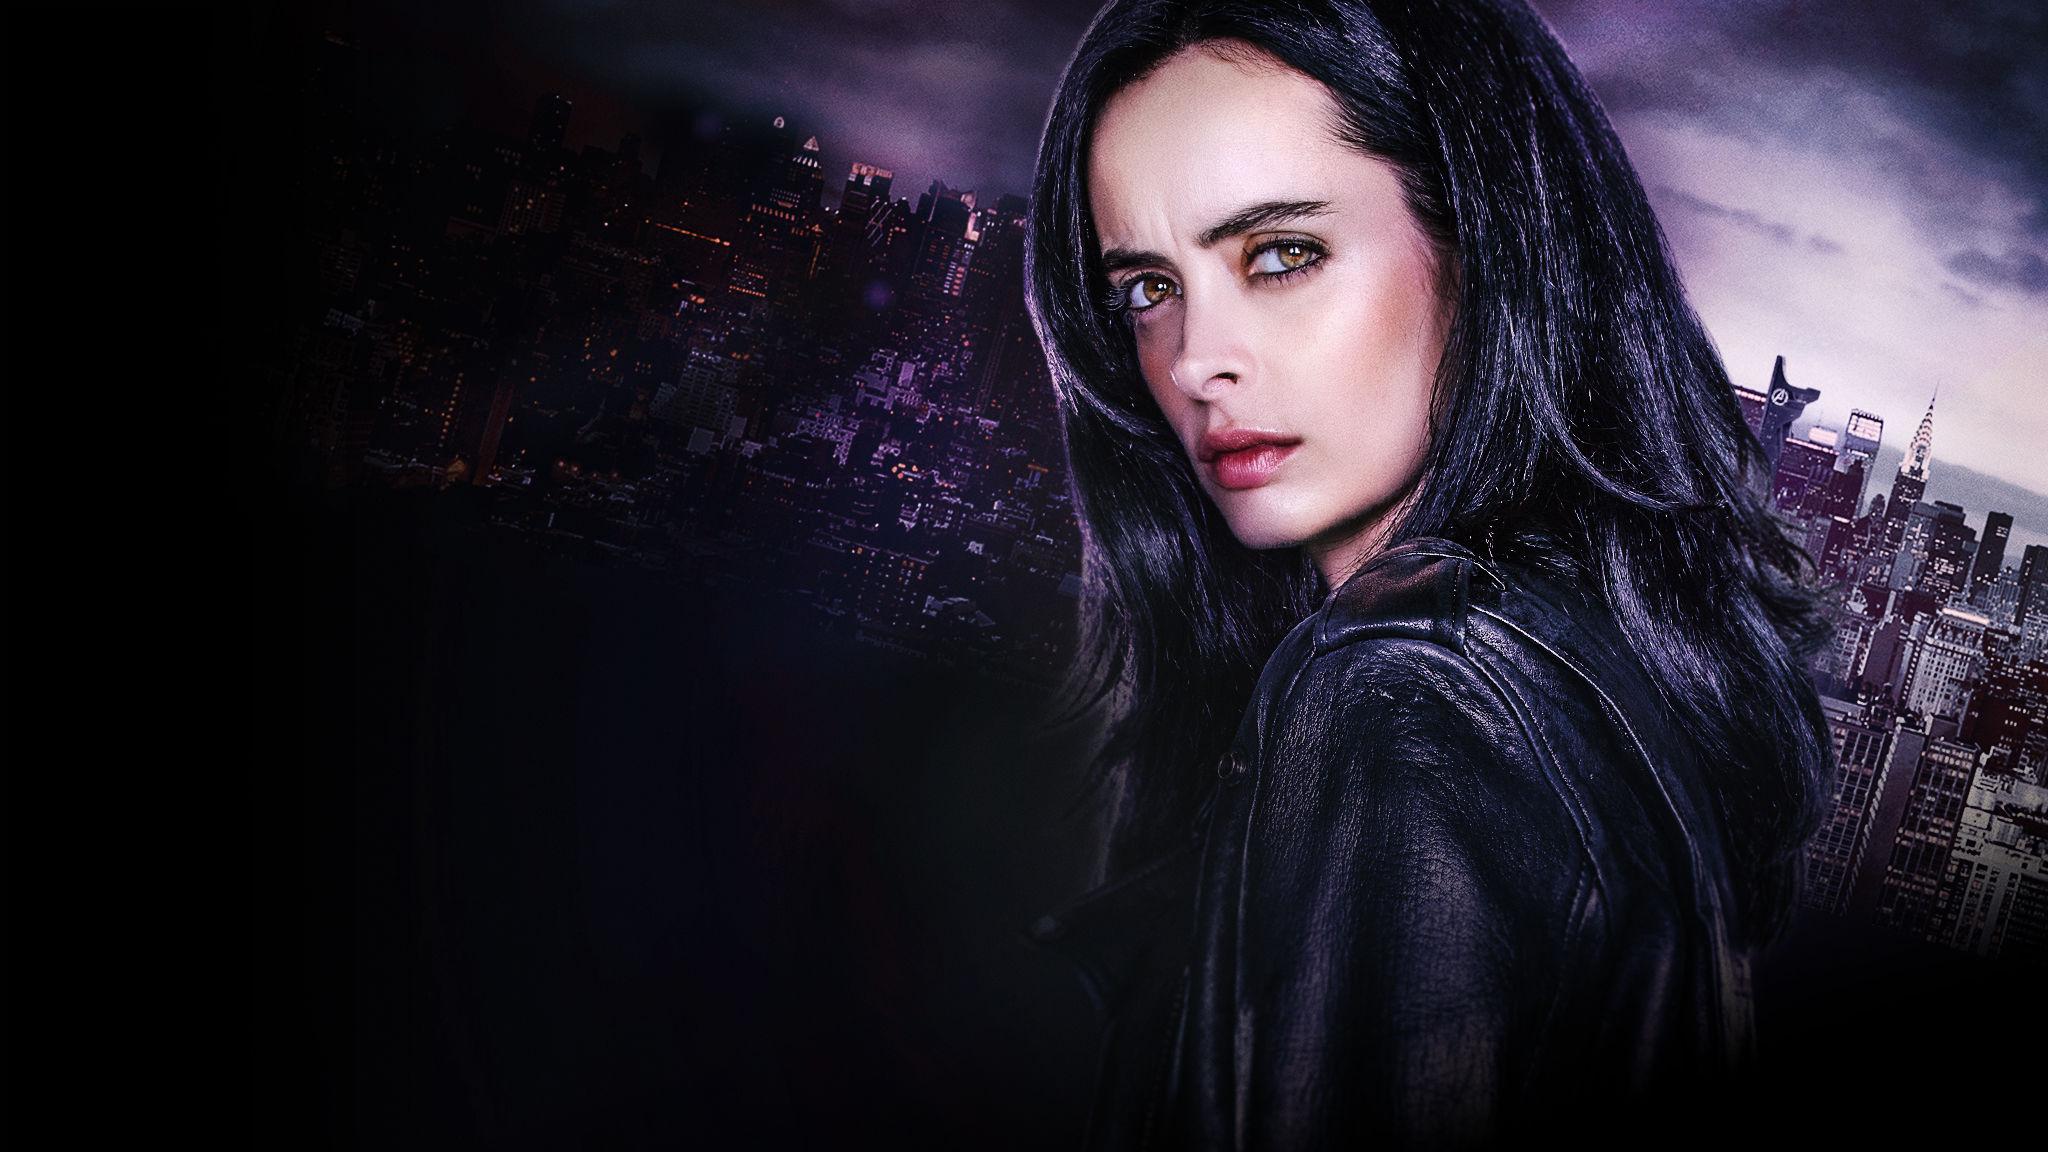 GlasgowLiving, Netflix, Jessica Jones, girl looking mysterious